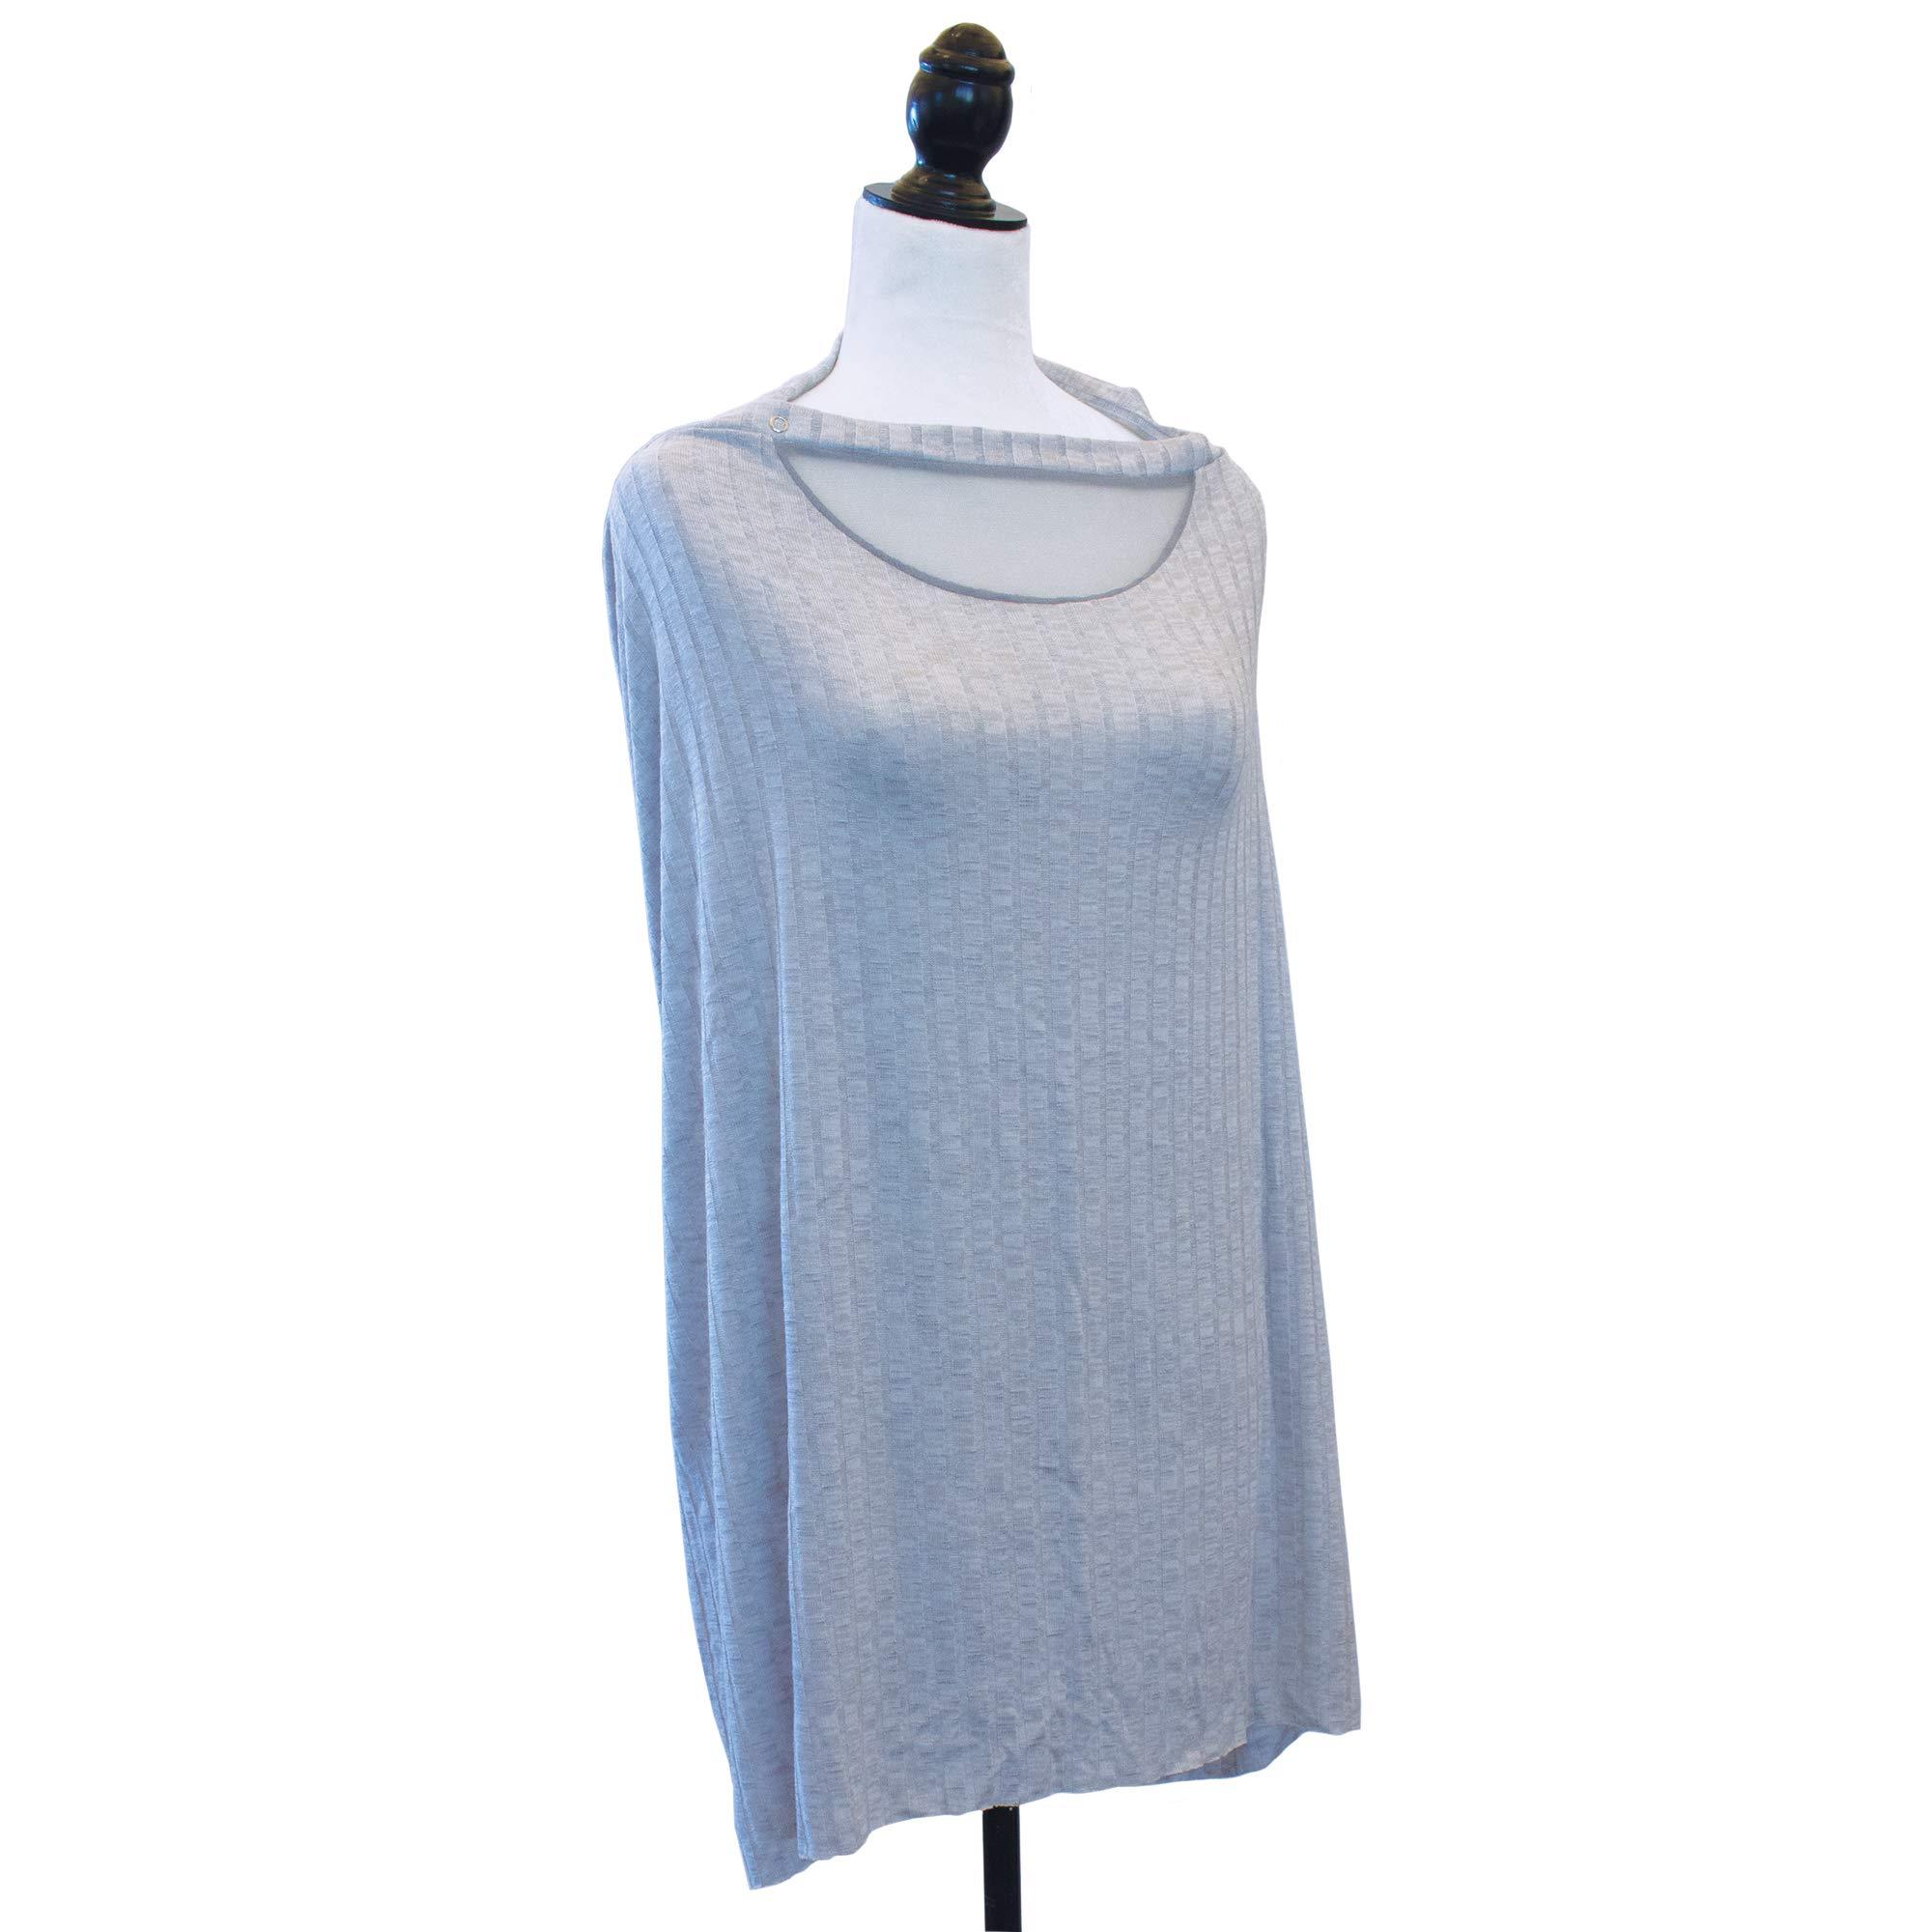 Boppy Infinity Nursing Scarf, Silver Gray, fashionable nursing cover for breastfeeding by Boppy